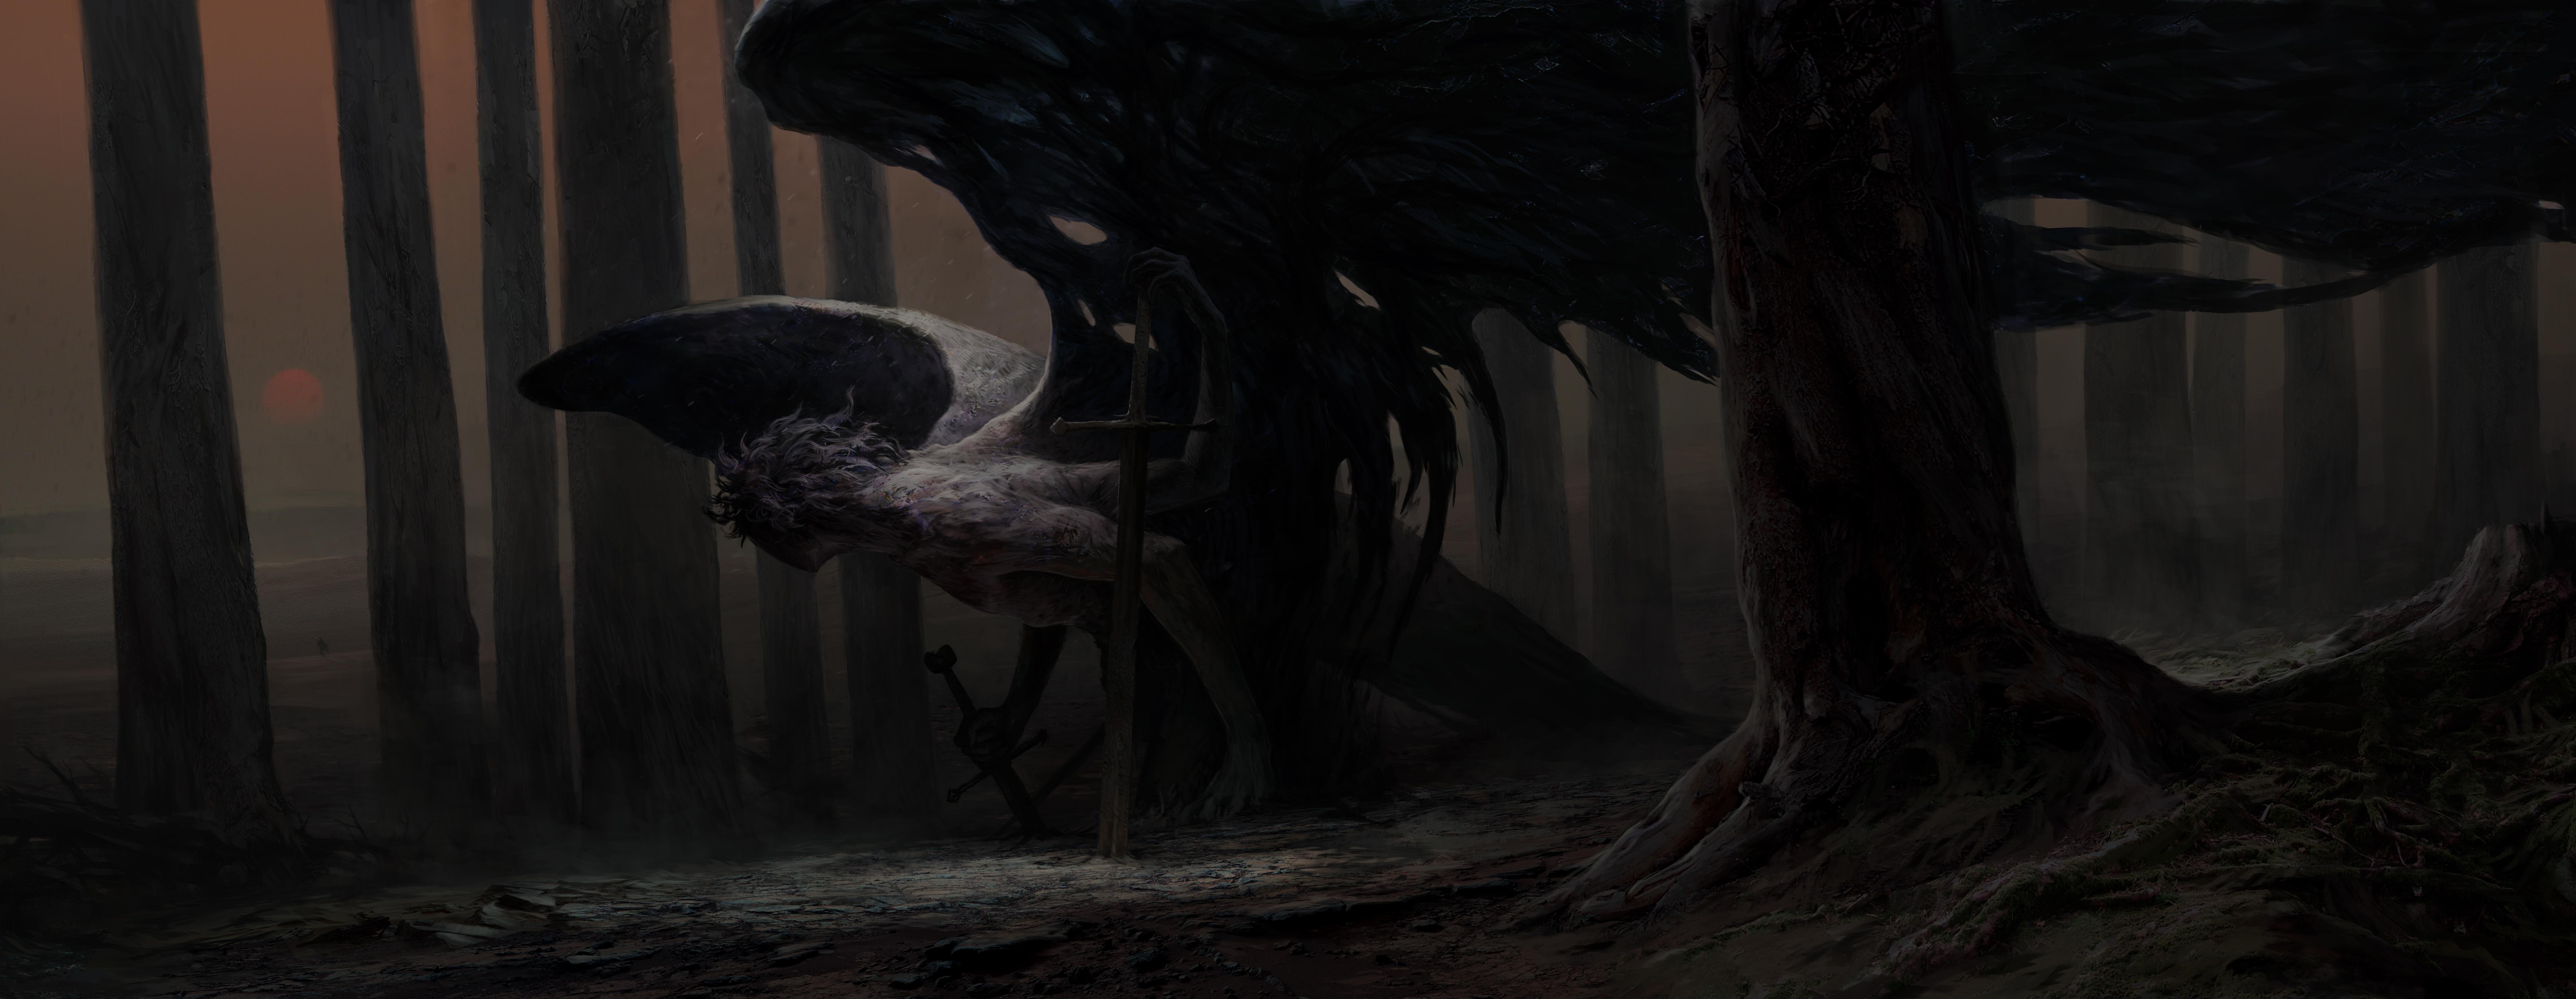 Creature Creepy Dark Sword Wings 8377x3248